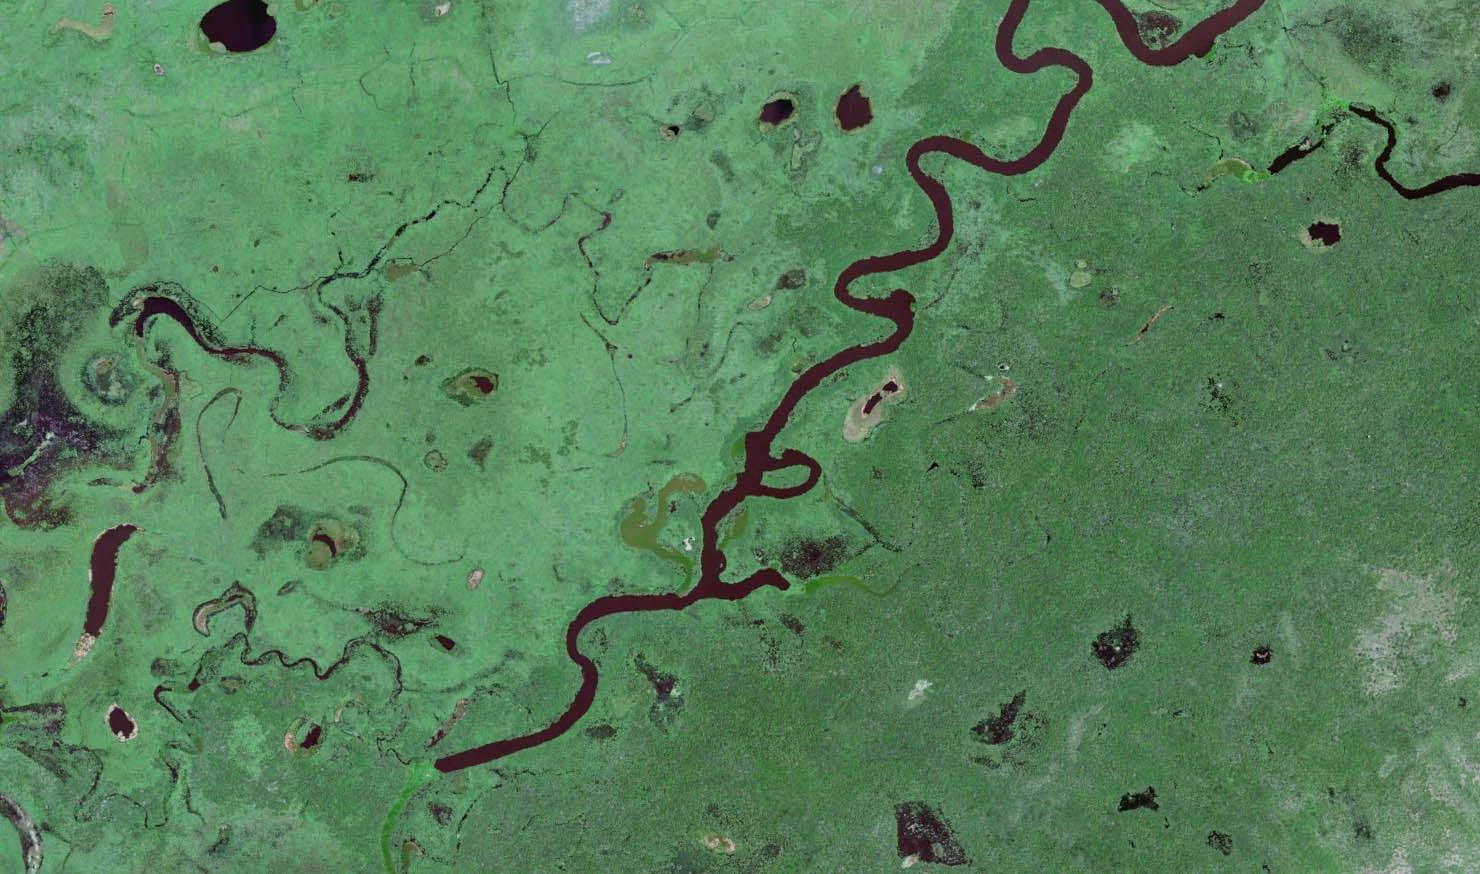 Reserva Particular do Patrimônio Natural SESC Pantanal